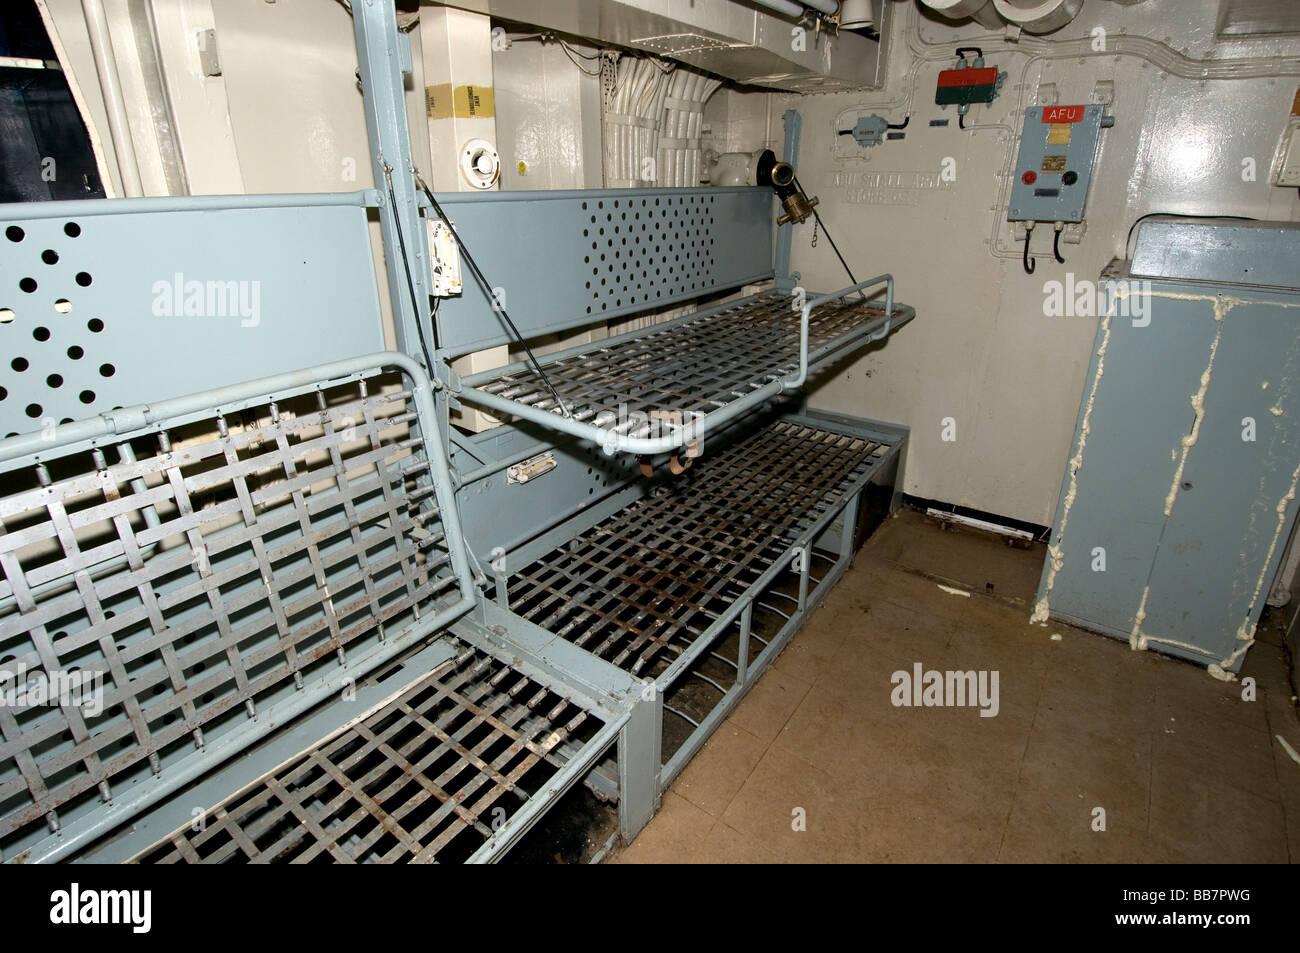 Navy Ship Bunk Beds Stock Photo Royalty Free Image